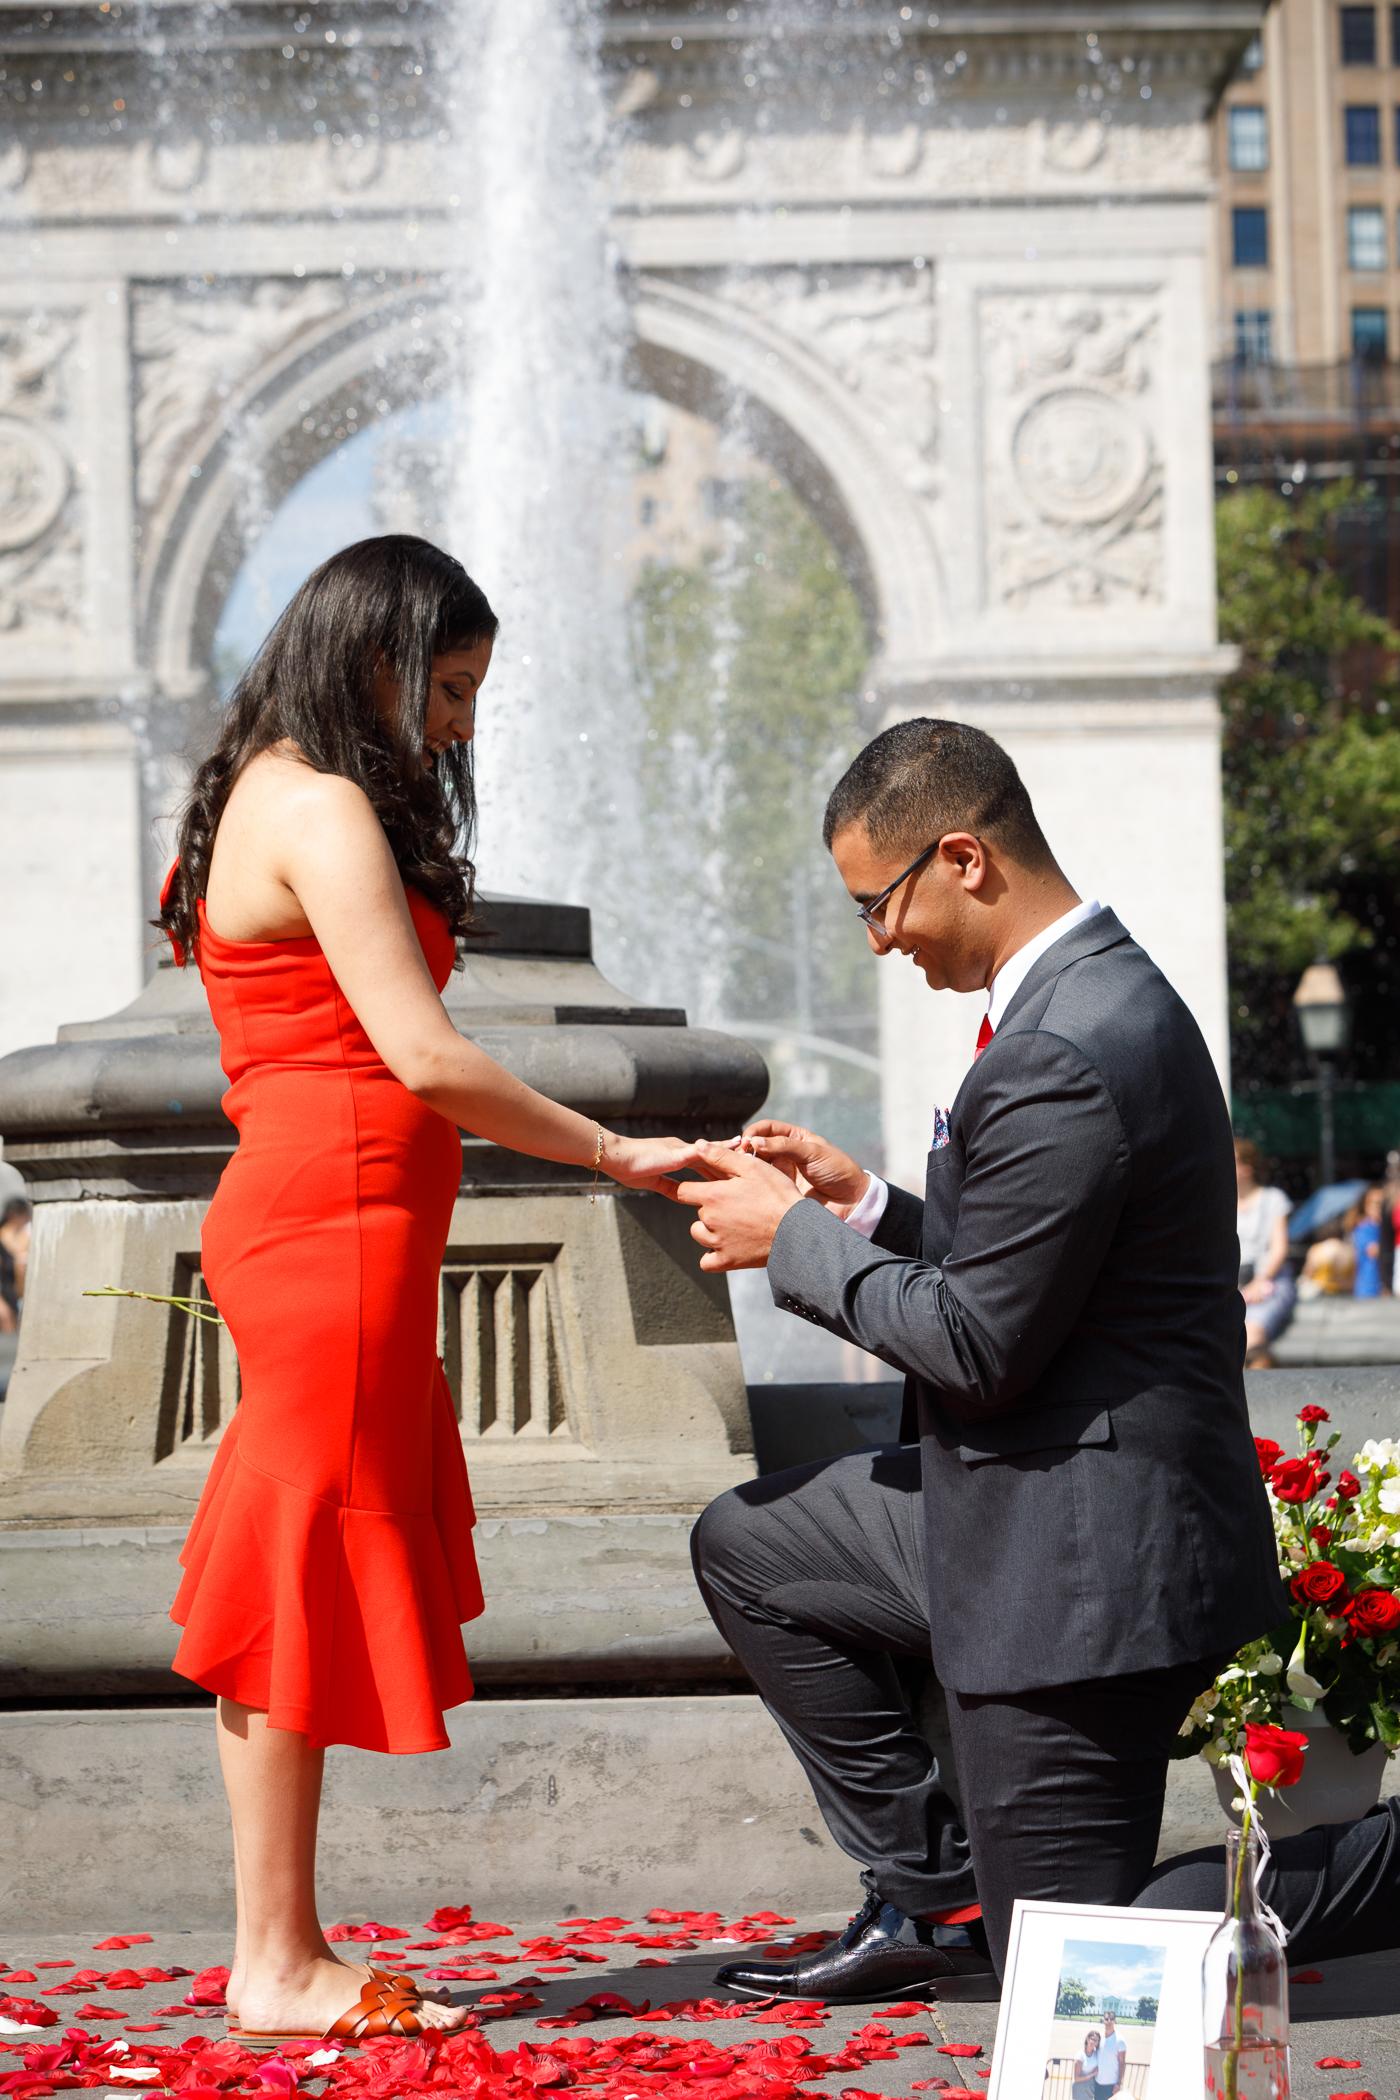 Kiro Rebecca Washington Square Park Marriage Proposal _ Jonathan Heisler _ 6152019 _023.jpg